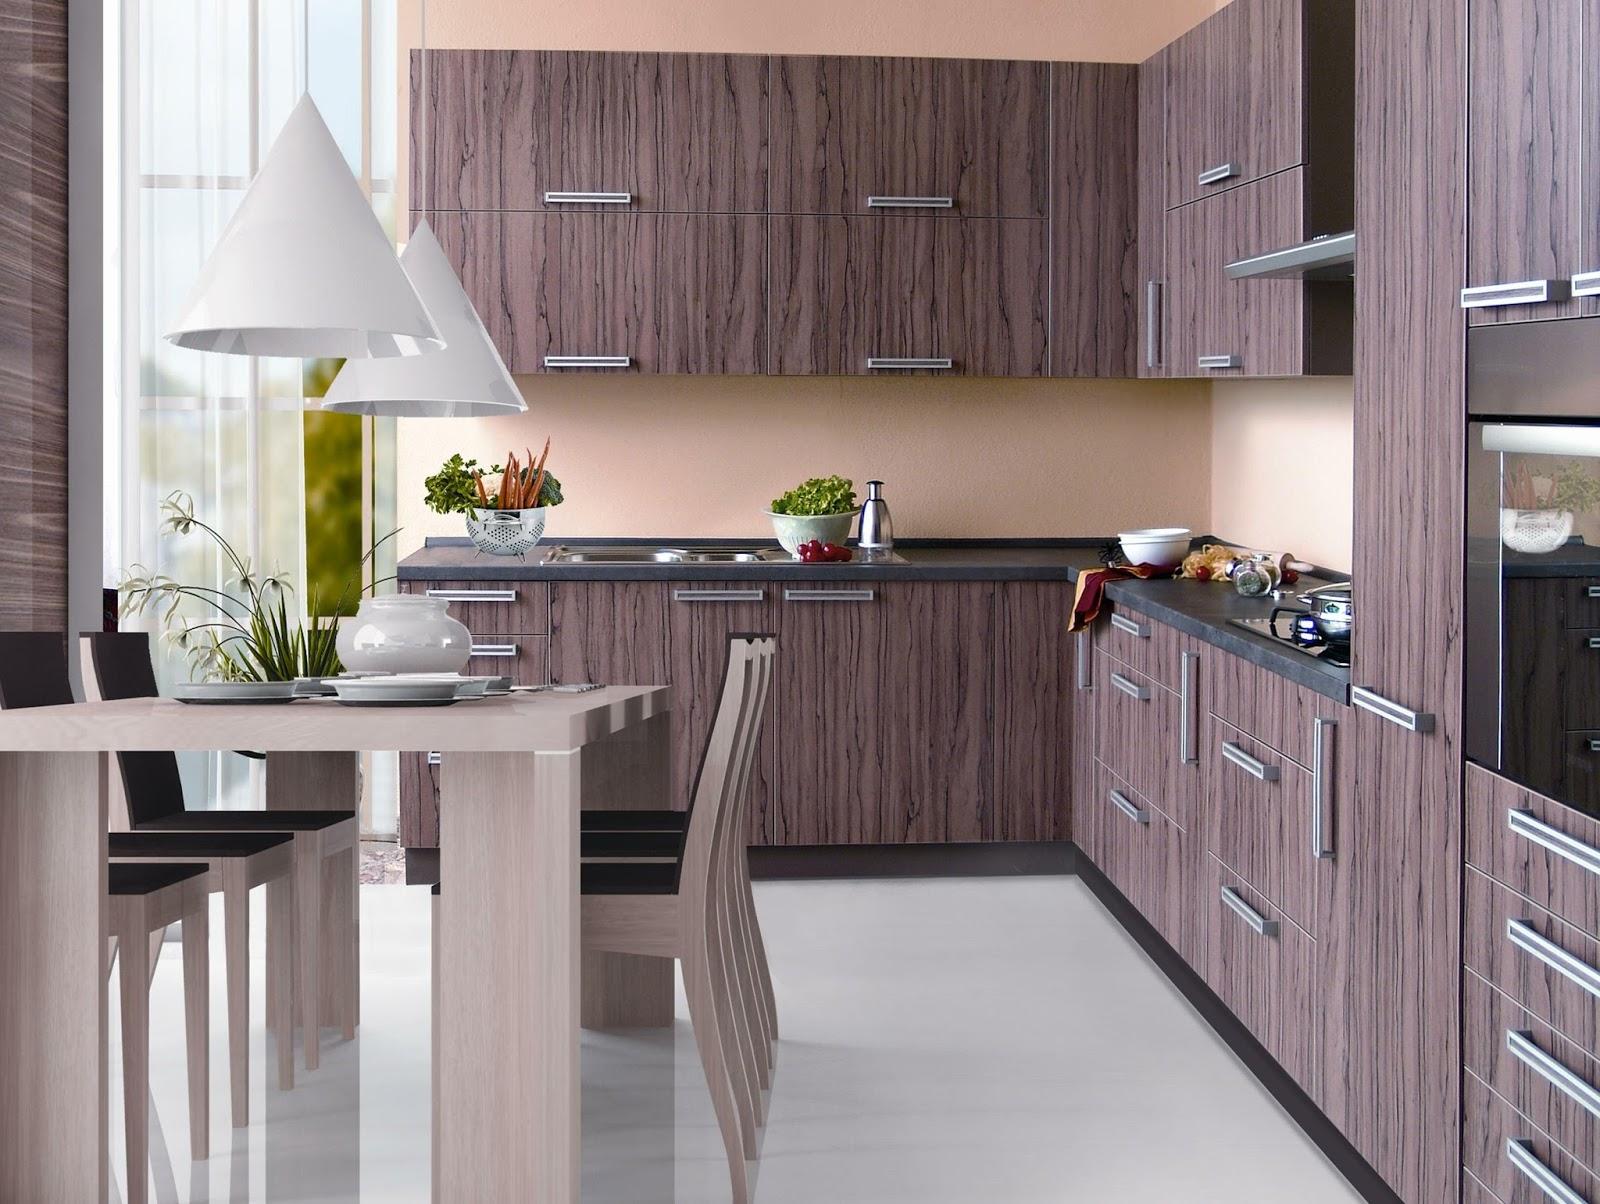 49 gambar kitchen set minimalis untuk dapur kecil dan for Kitchen set b q